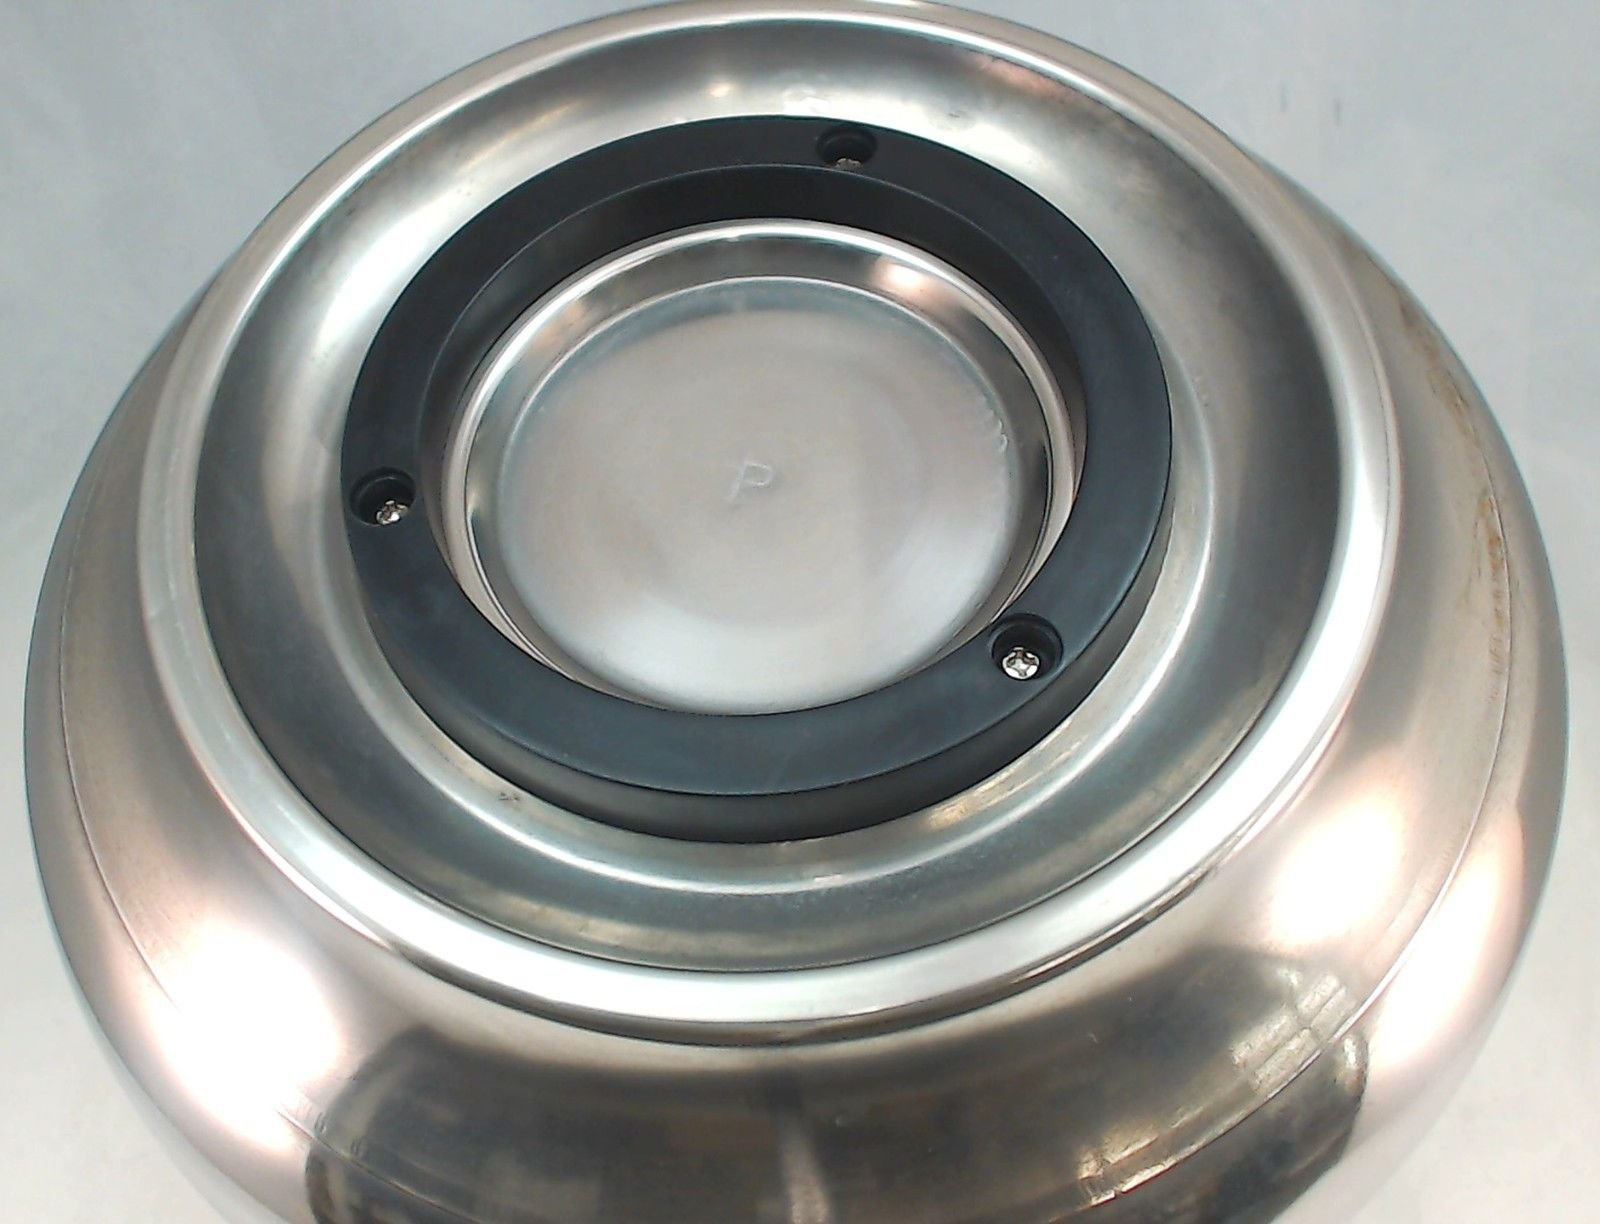 Sunbeam 144700-000-000 Stainless Steel Mixer Bowl 4.6 Quart by Sunbeam (Image #2)